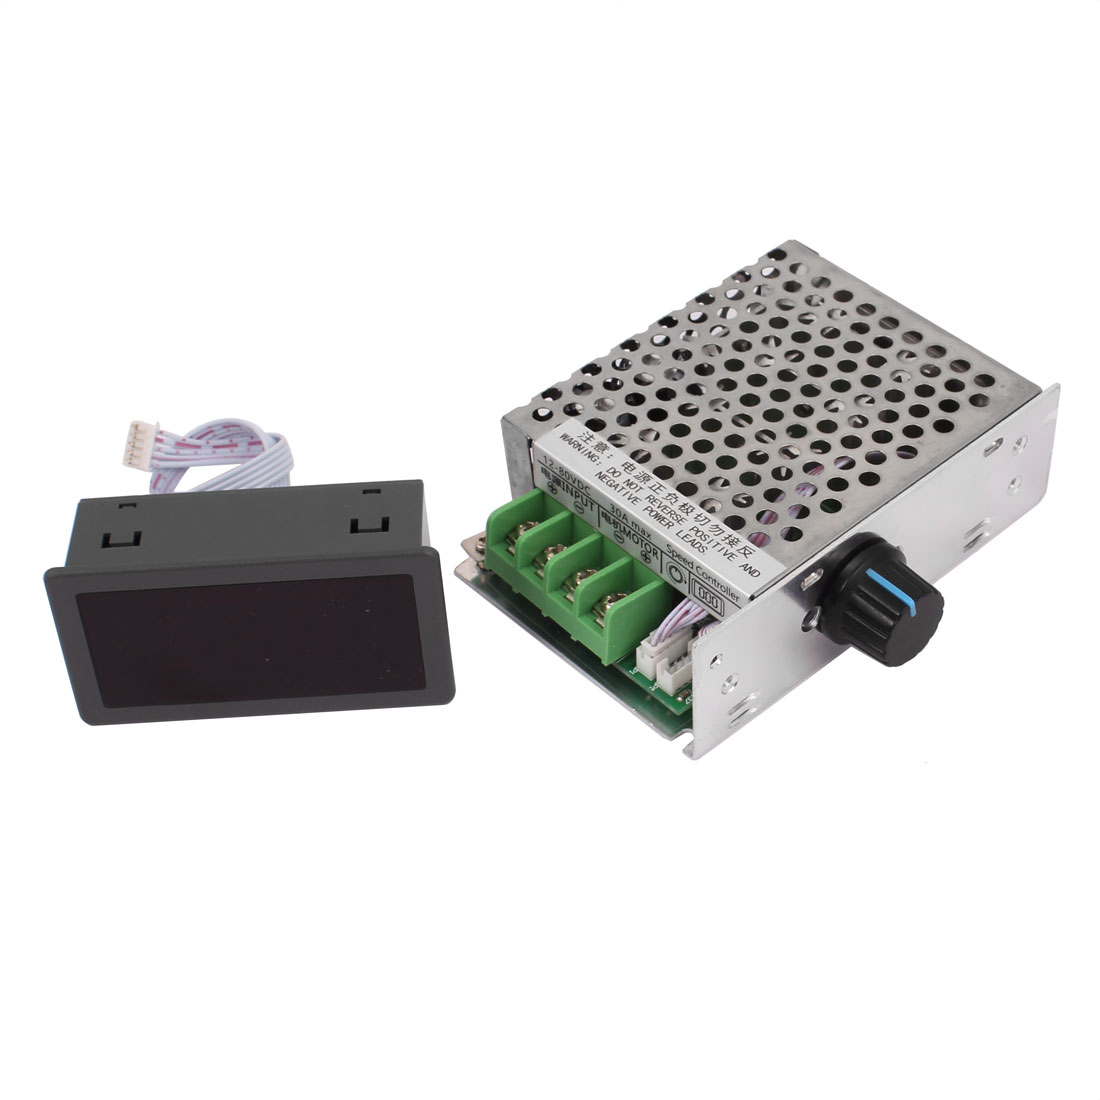 12-80V 30A Digital LED Display DC Brush Motor Speed PWM Controller Switch